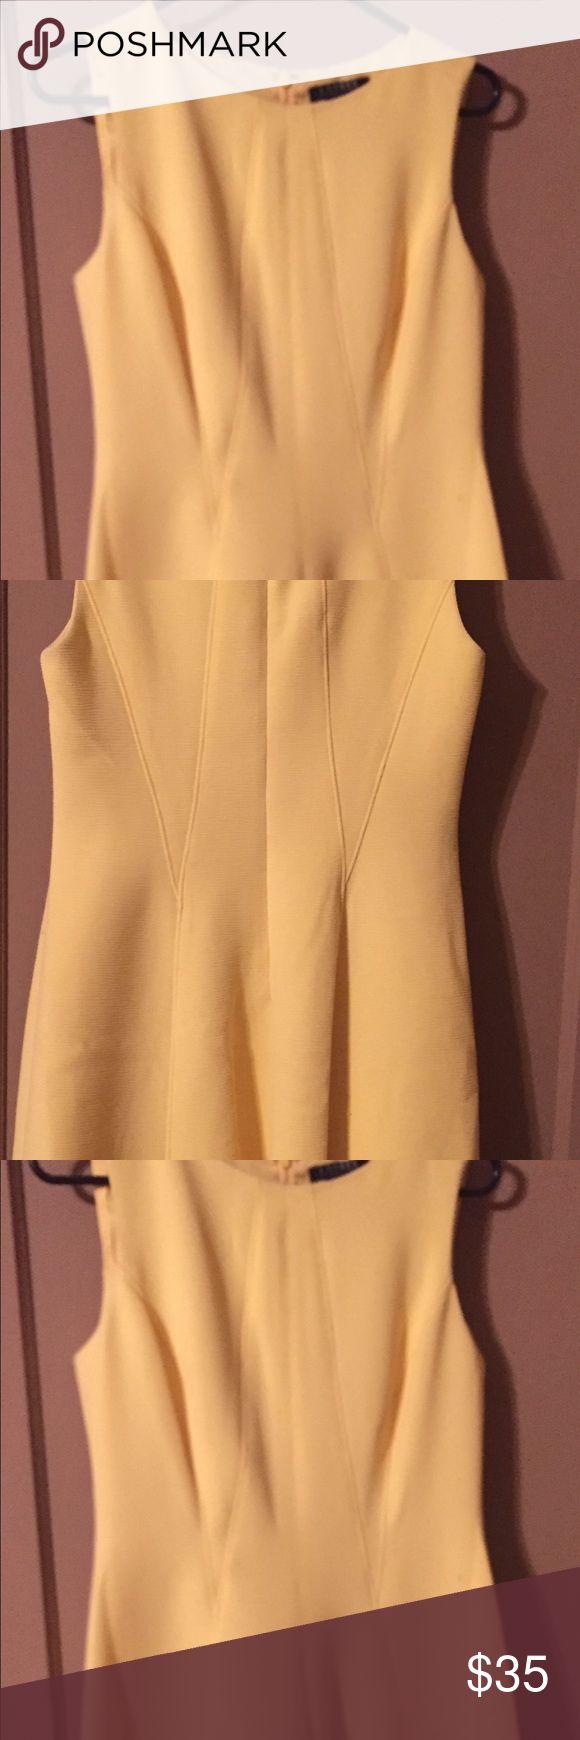 Ralph Lauren yellow short dress It's a beautiful yellow dress I wore in my sisters wedding Ralph Lauren Dresses Wedding